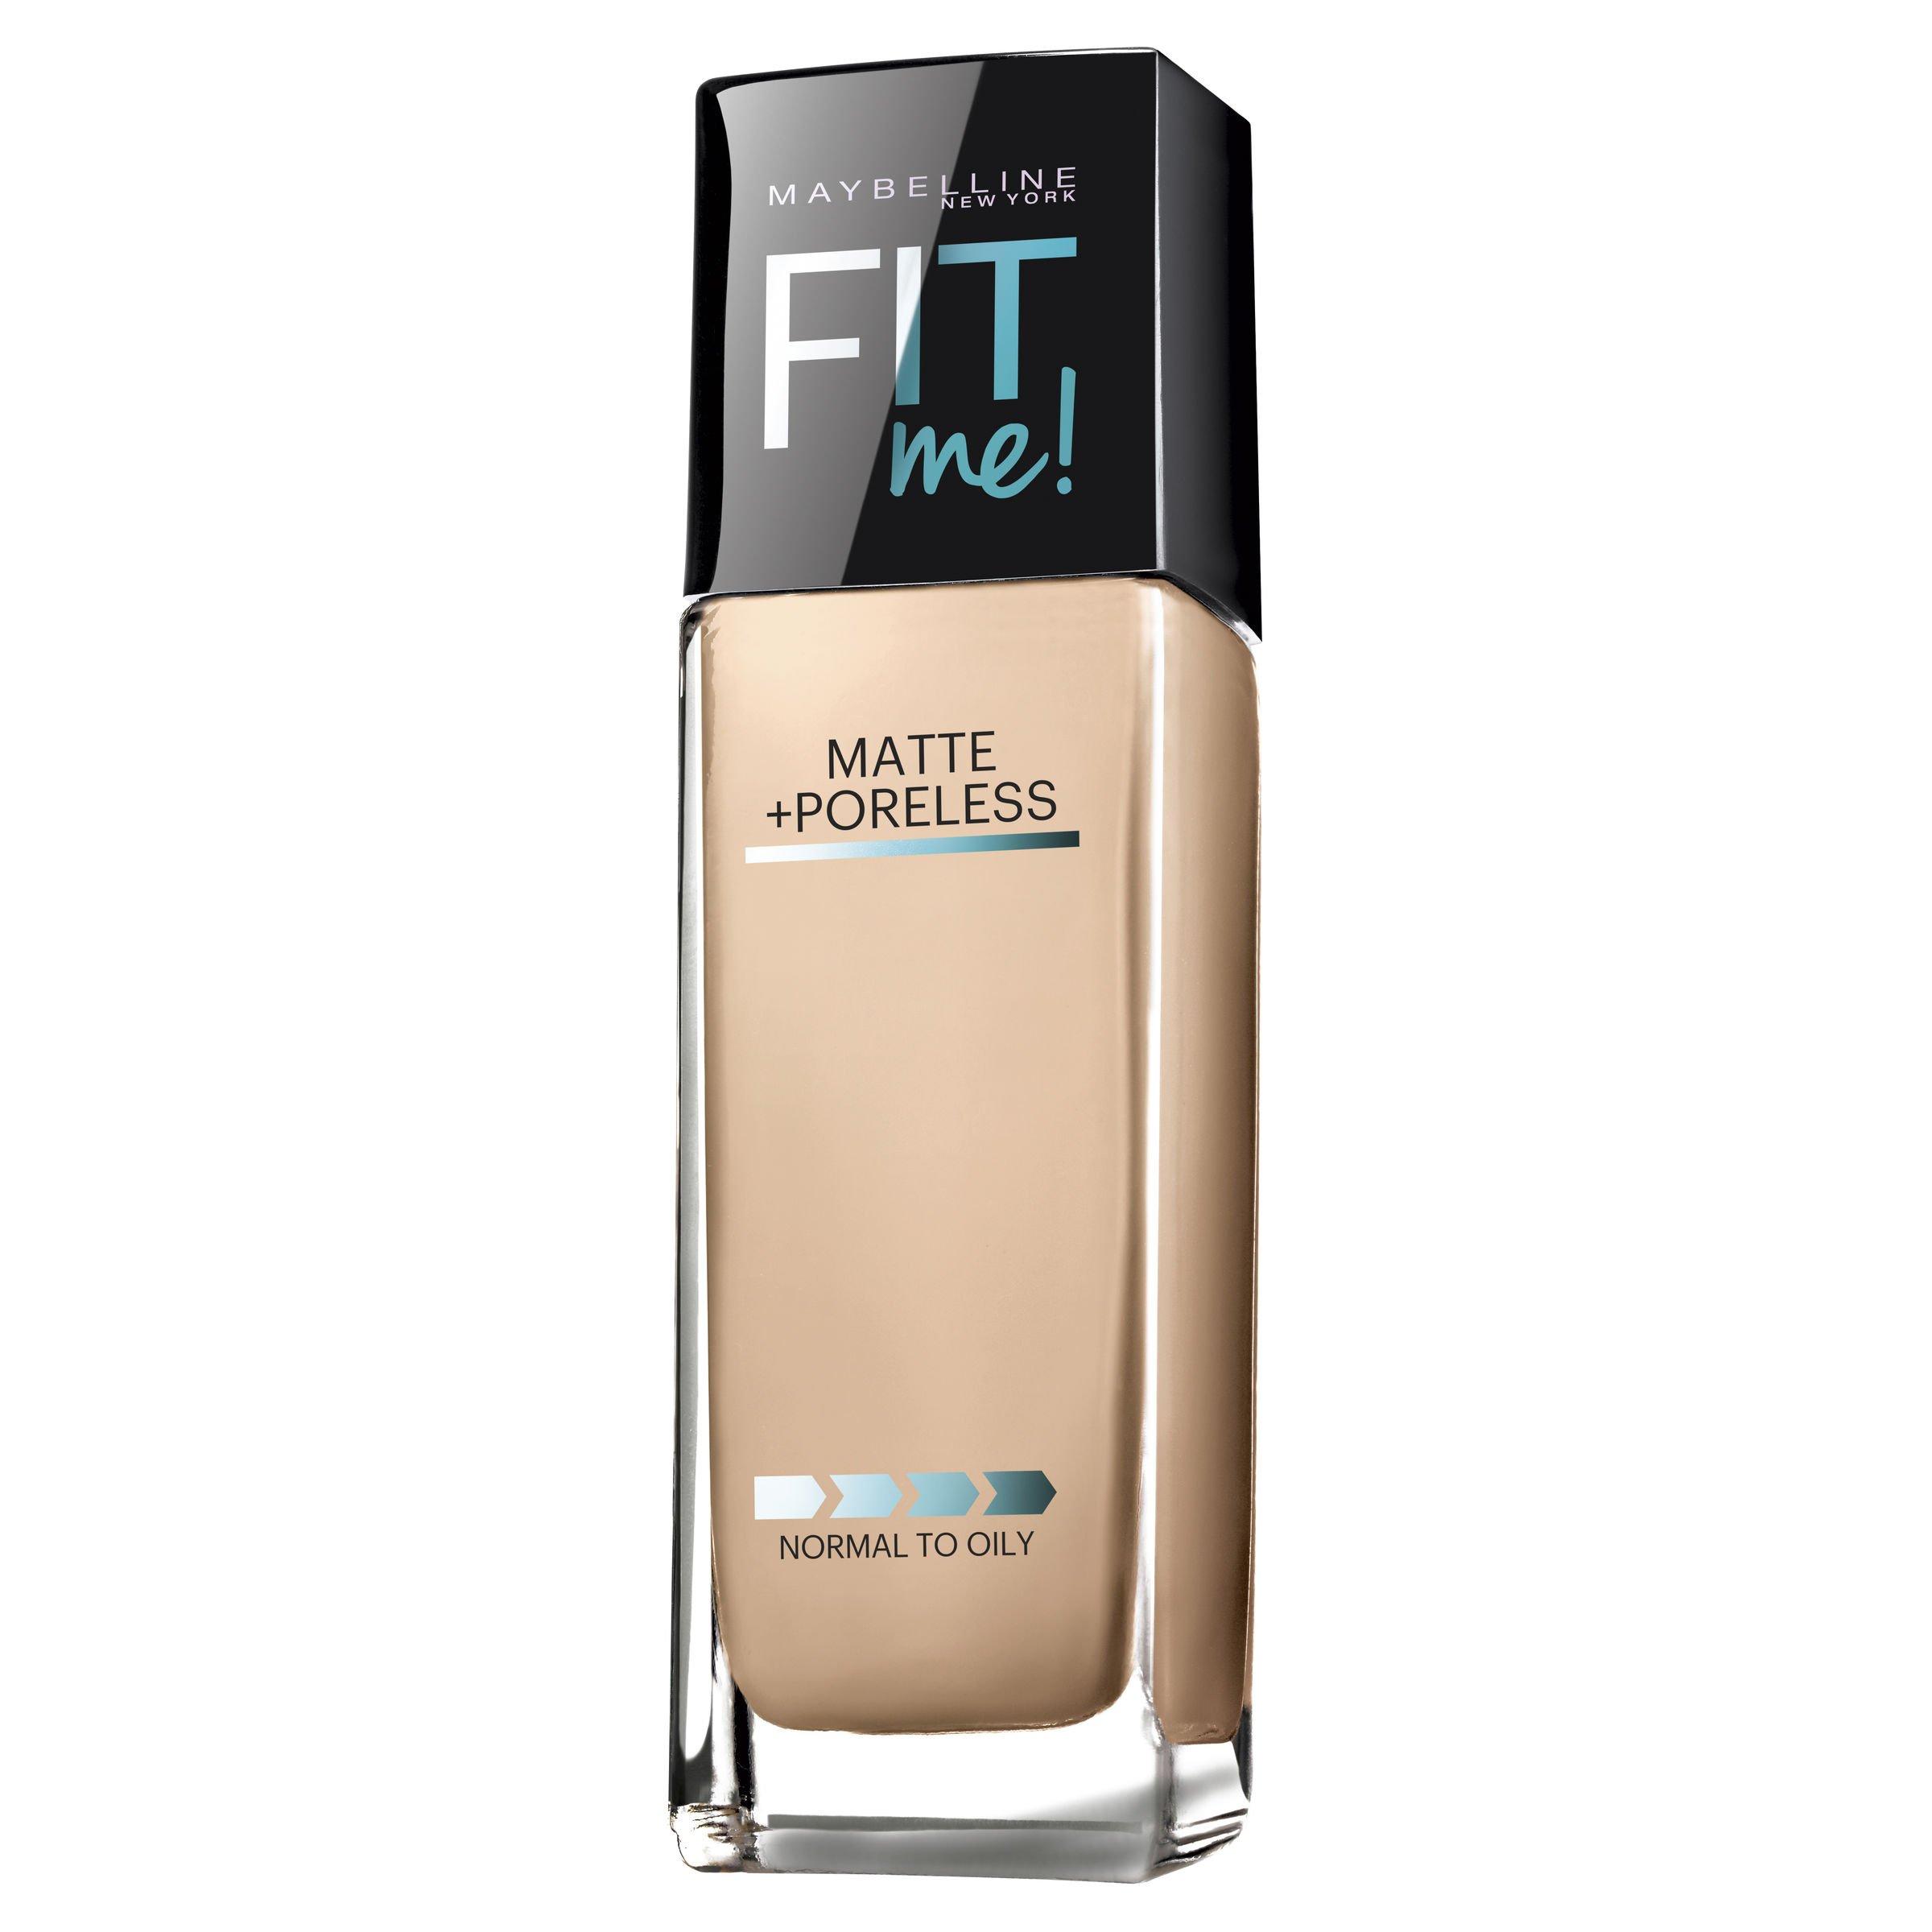 Maybelline Fit Me Matte + Poreless Foundation, Classic Ivory, 1 fl. oz.